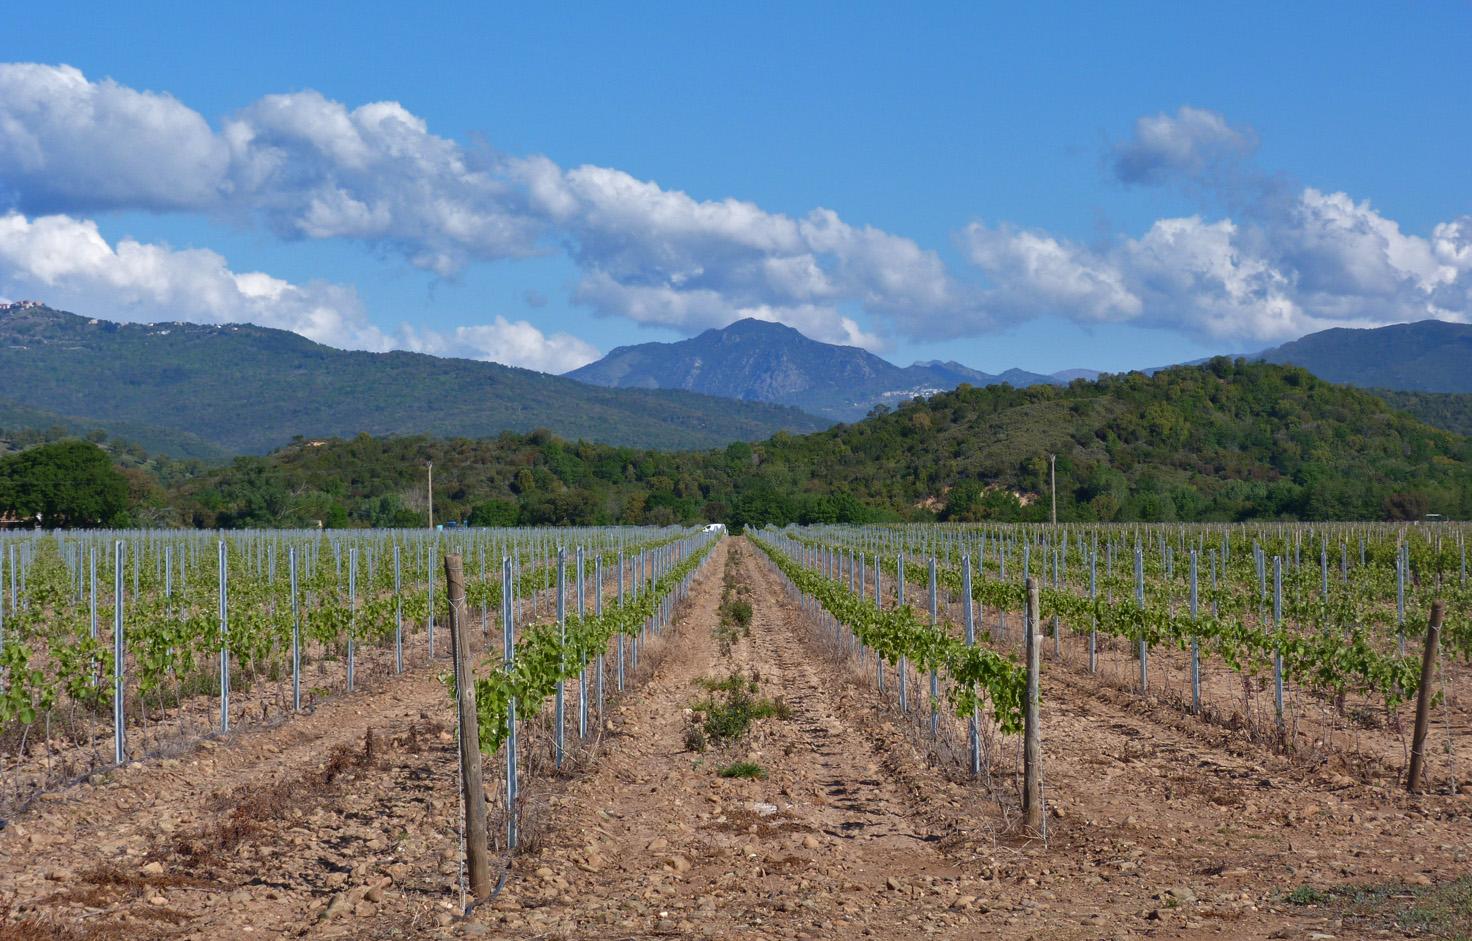 Vinefields near Aghione, Aleria